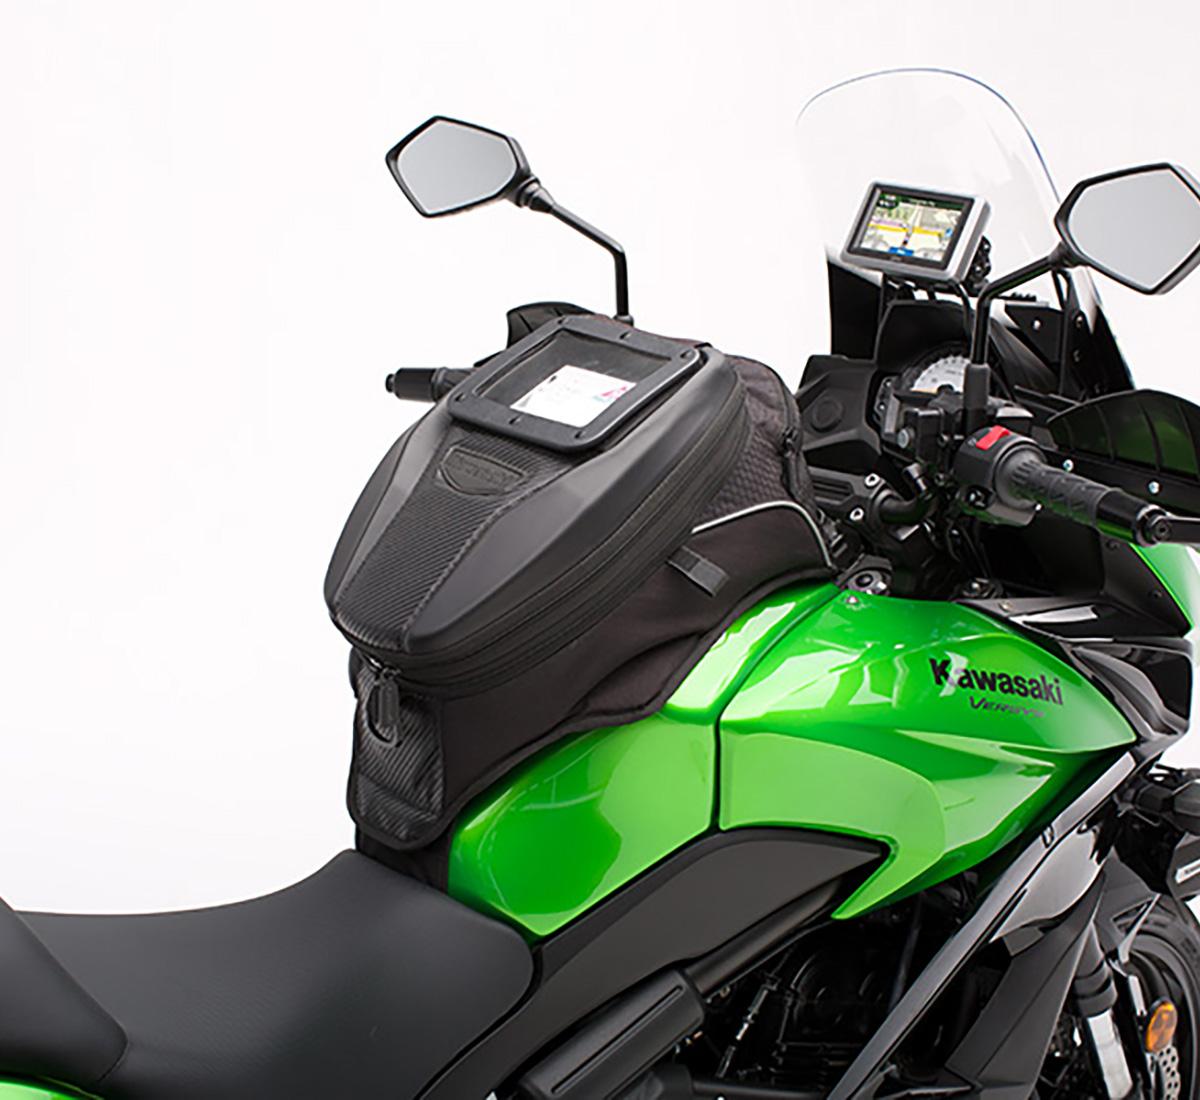 medium resolution of 2018 versys 650 lt versys motorcycle by kawasaki rh kawasaki com 2018 kawasaki versys 650 2015